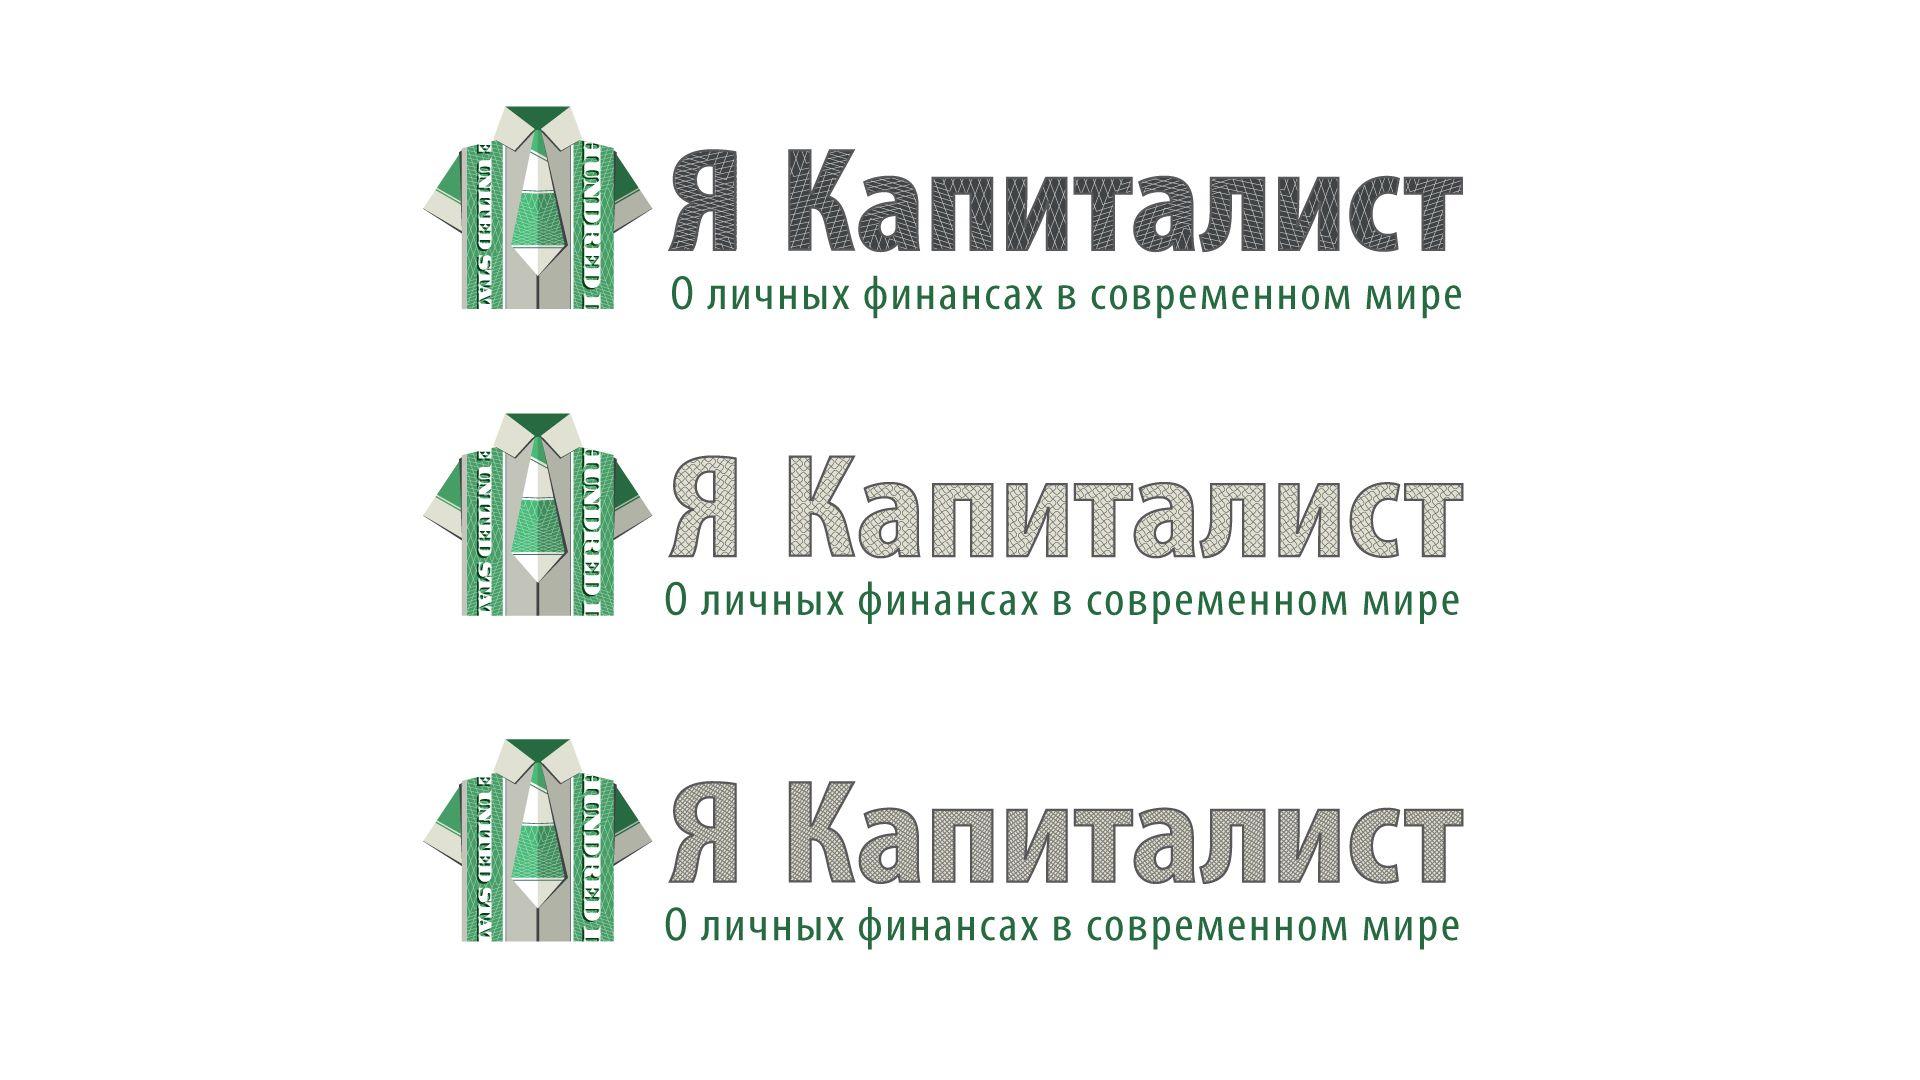 Я капиталист (лого для веб-сайта) - дизайнер Ju_Levich